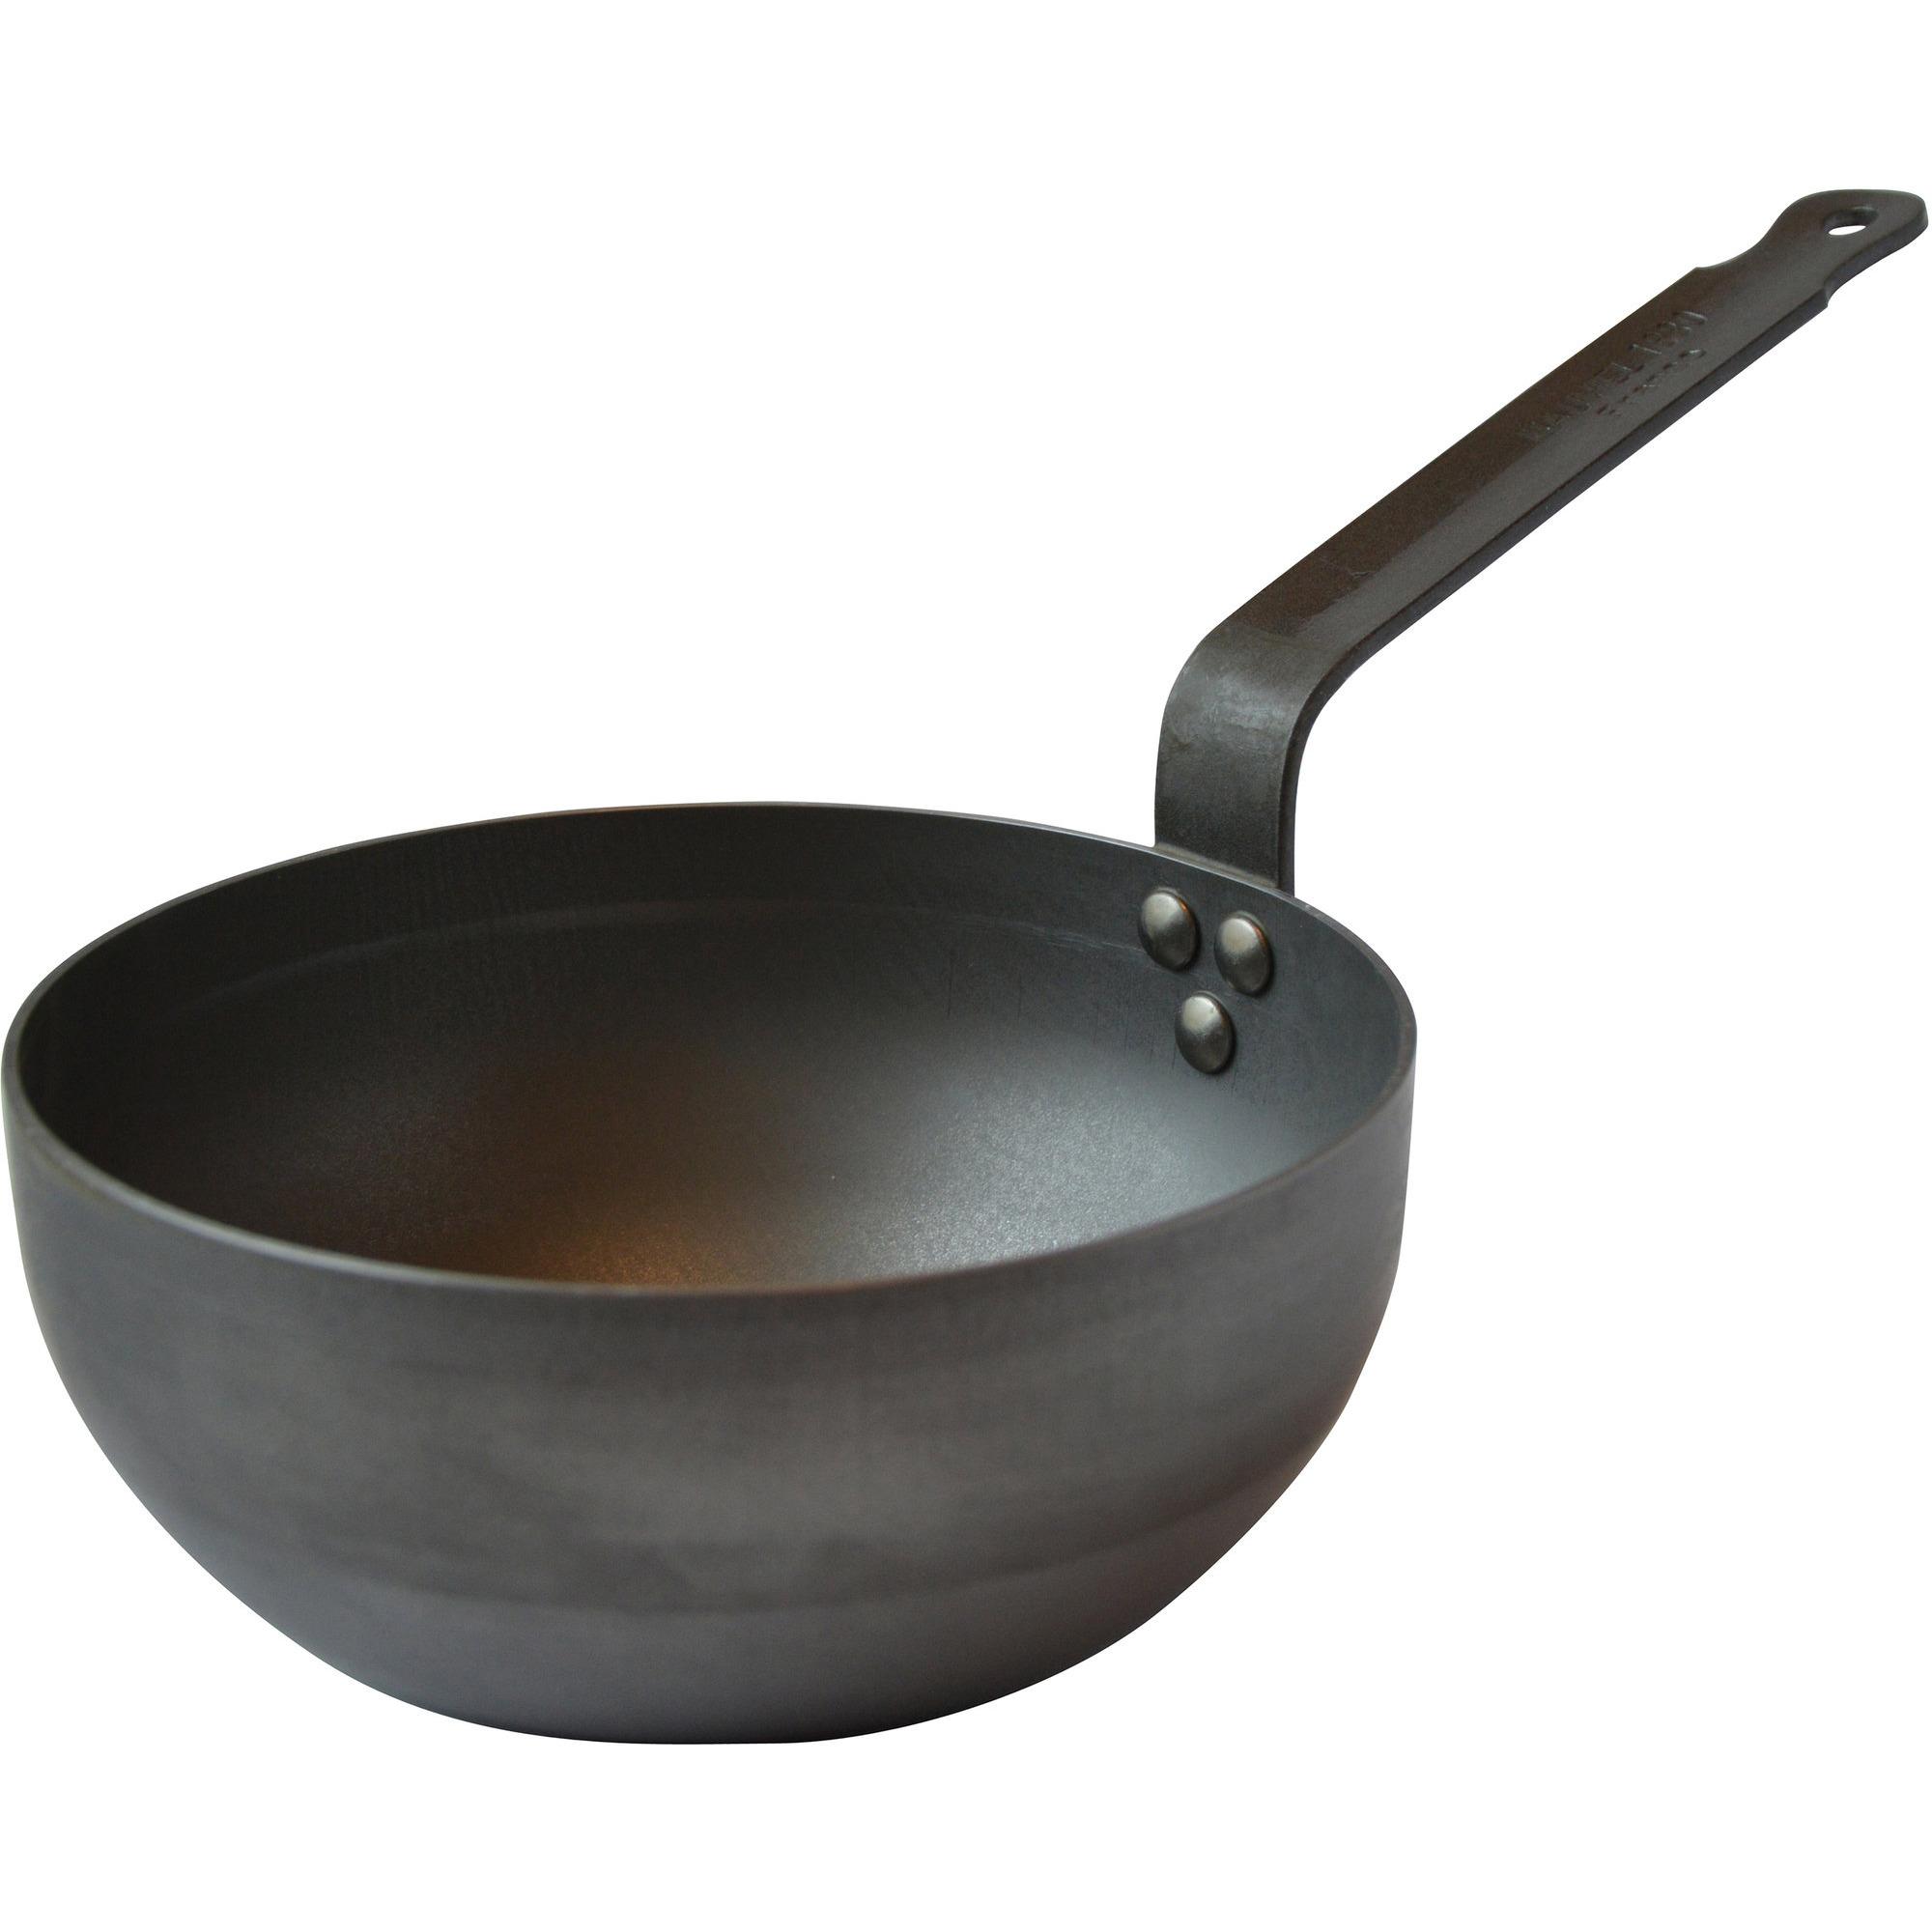 Mauviel Sautepanna rundat kolstål Ø 28 cm